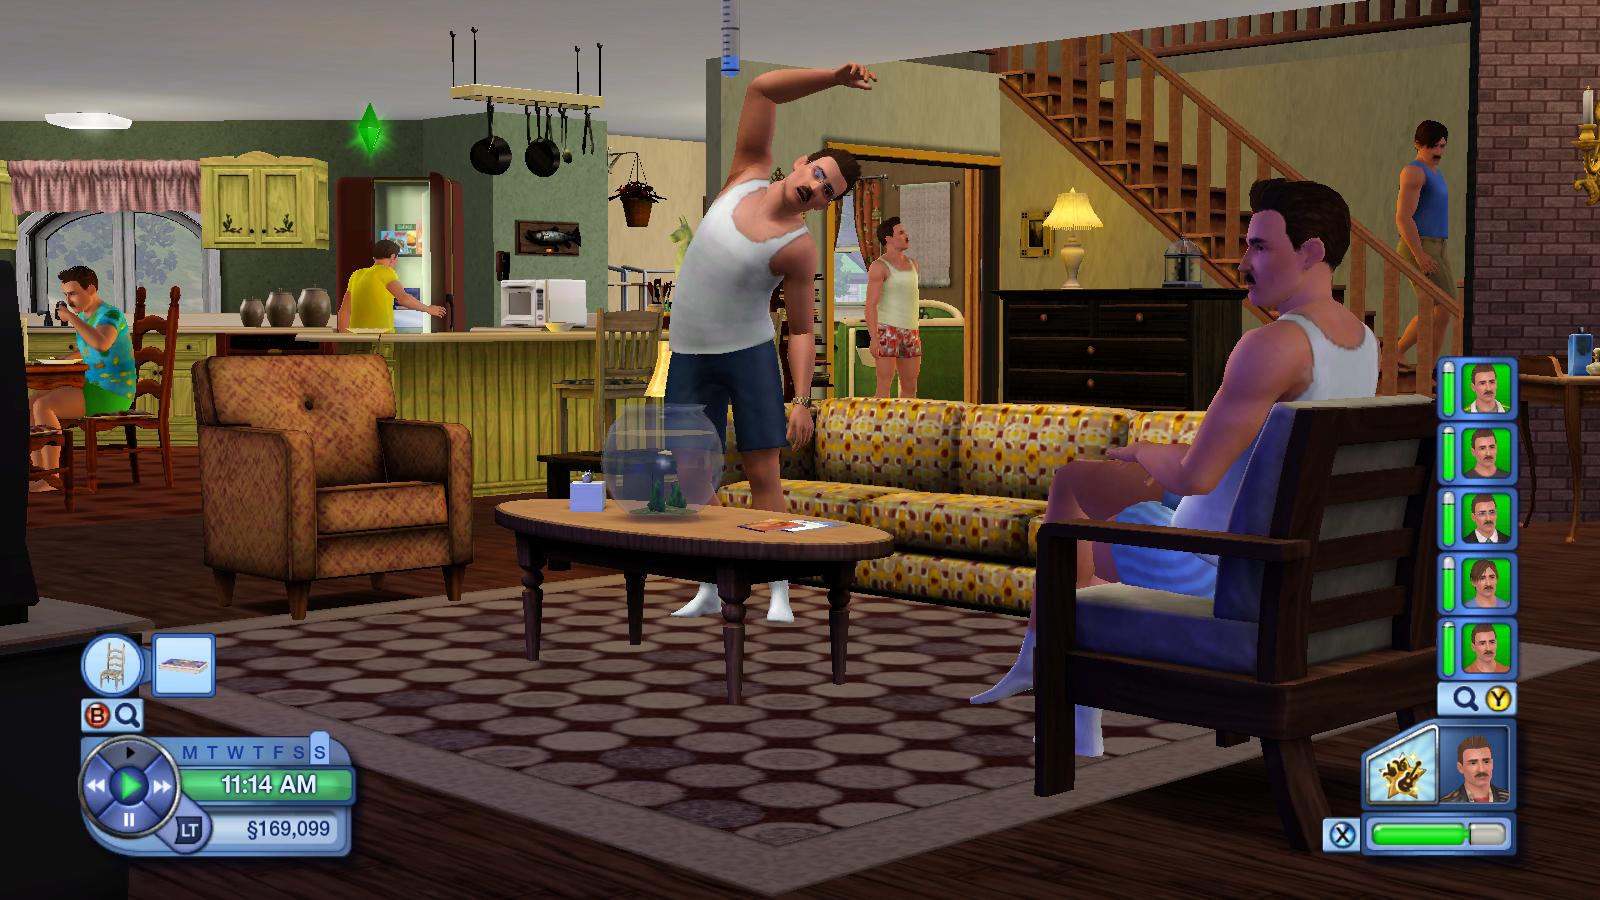 Cheats In Home Design Sims 3 Geld Cheat So Bekommst Du Viele Simoleons Giga